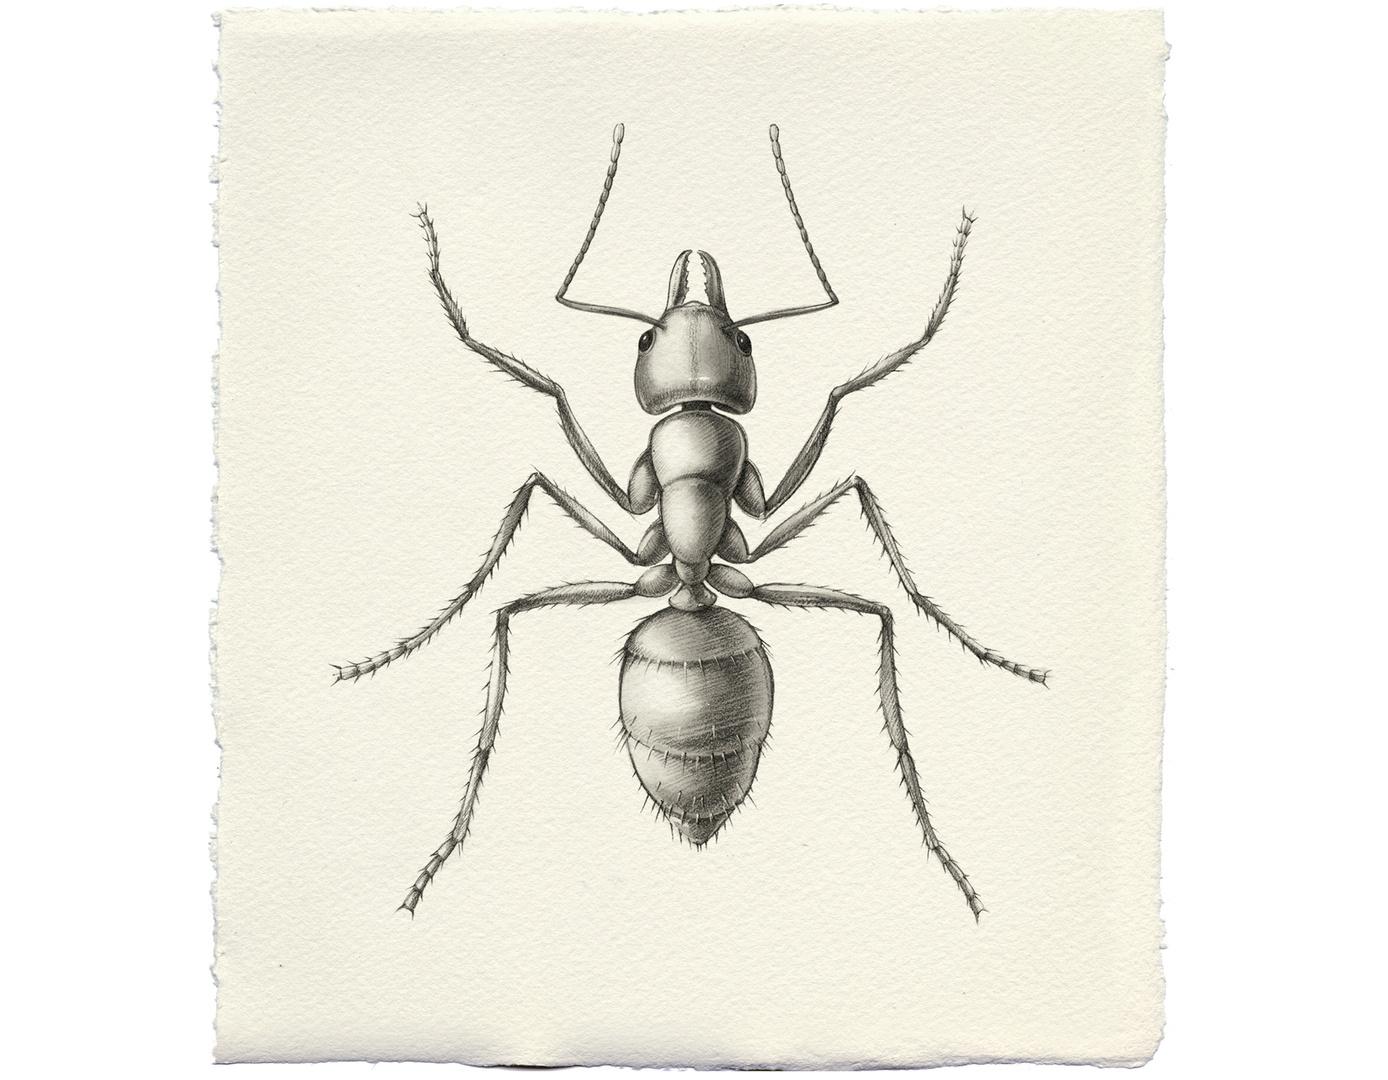 vwbk2012_Biodiversity_Formicidae@200.jpg